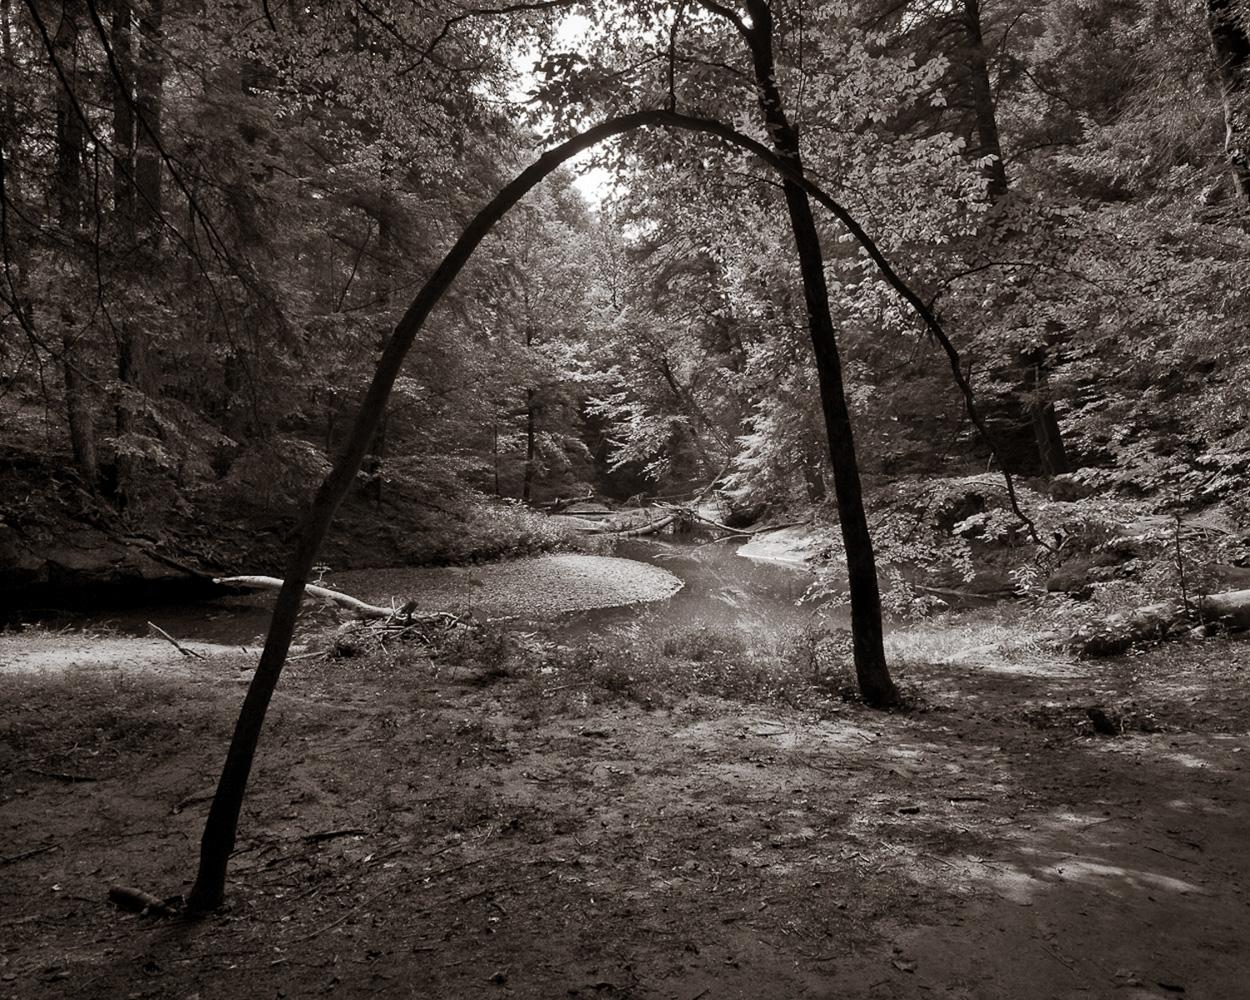 """Bending Tree"", Hocking Hills State Park, OH, 2013"